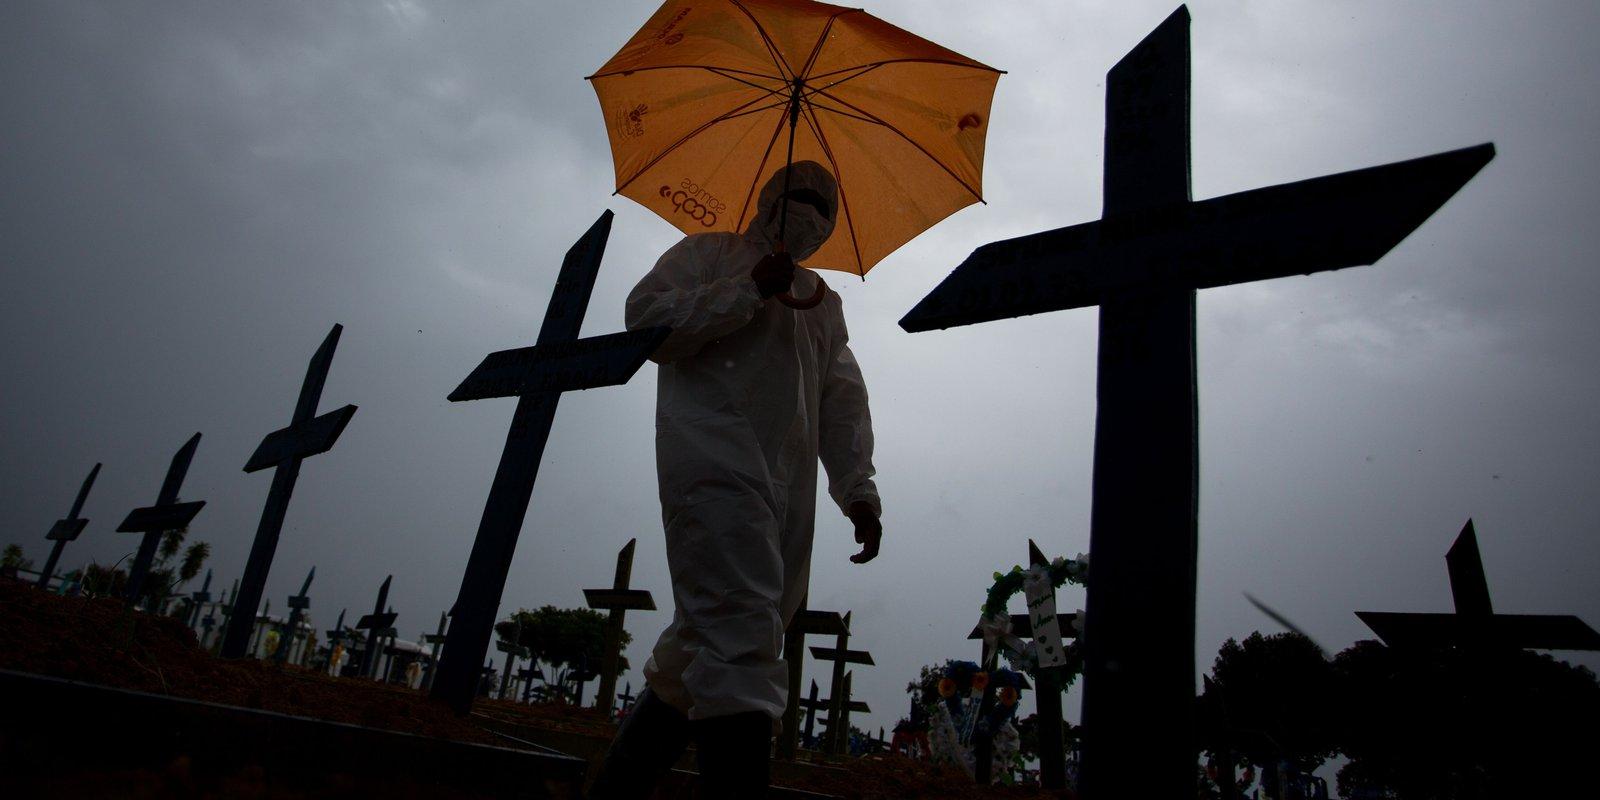 Walking past crosses marking the COVID-19 burials at the Nossa Senhora Aparecida cemetery, in Manaus, Brazil. Photo by MICHAEL DANTAS/AFP via Getty Images.